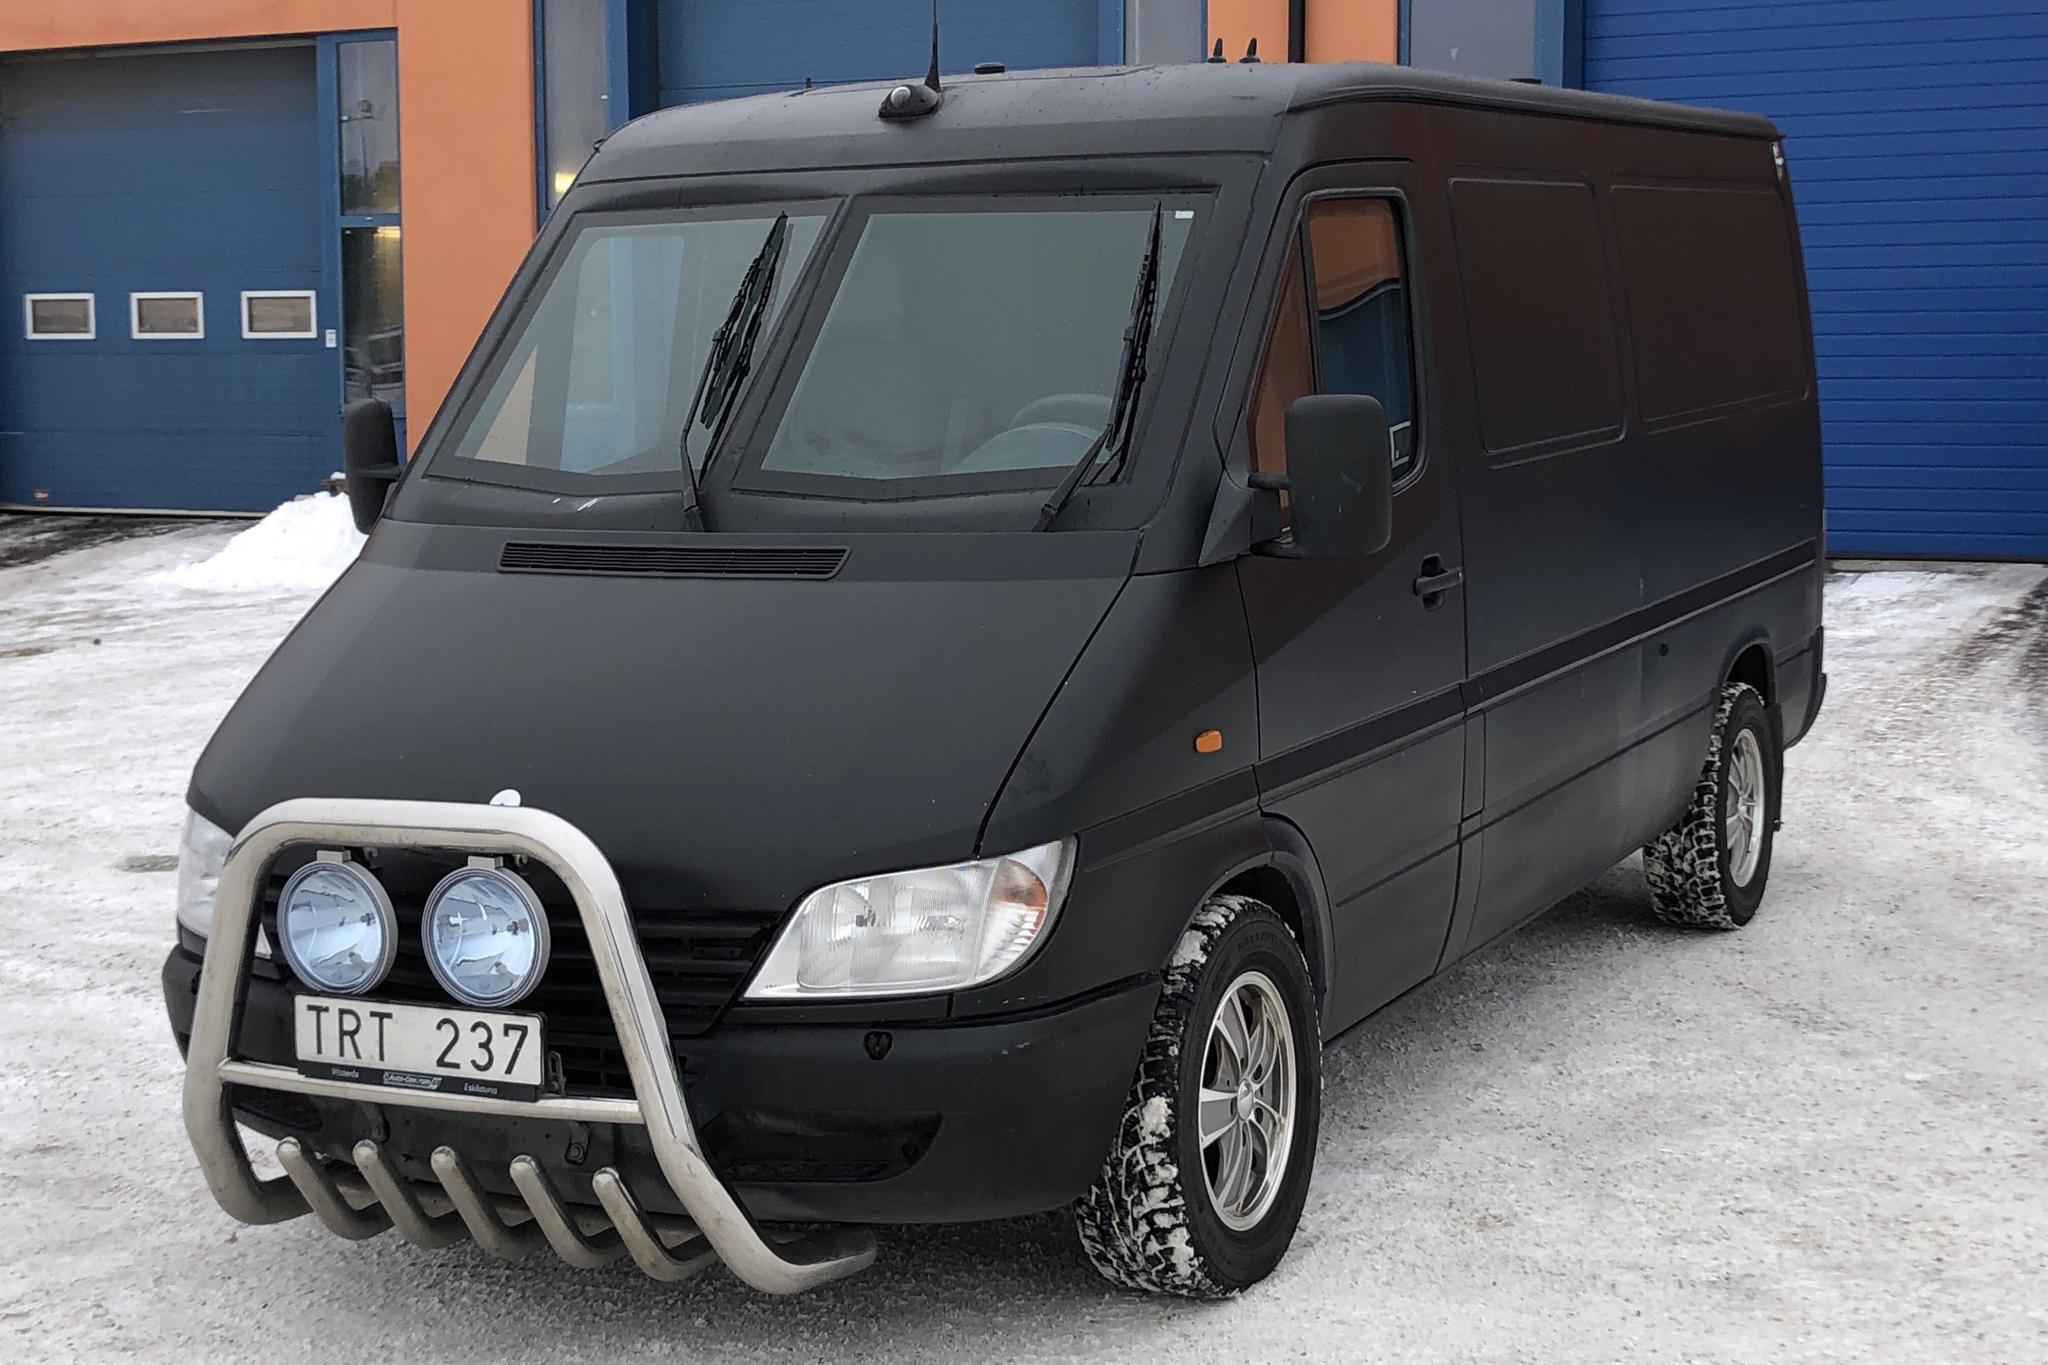 Mercedes Sprinter 313 CDI (129hk) - 27 609 mil - Automat - svart - 2002